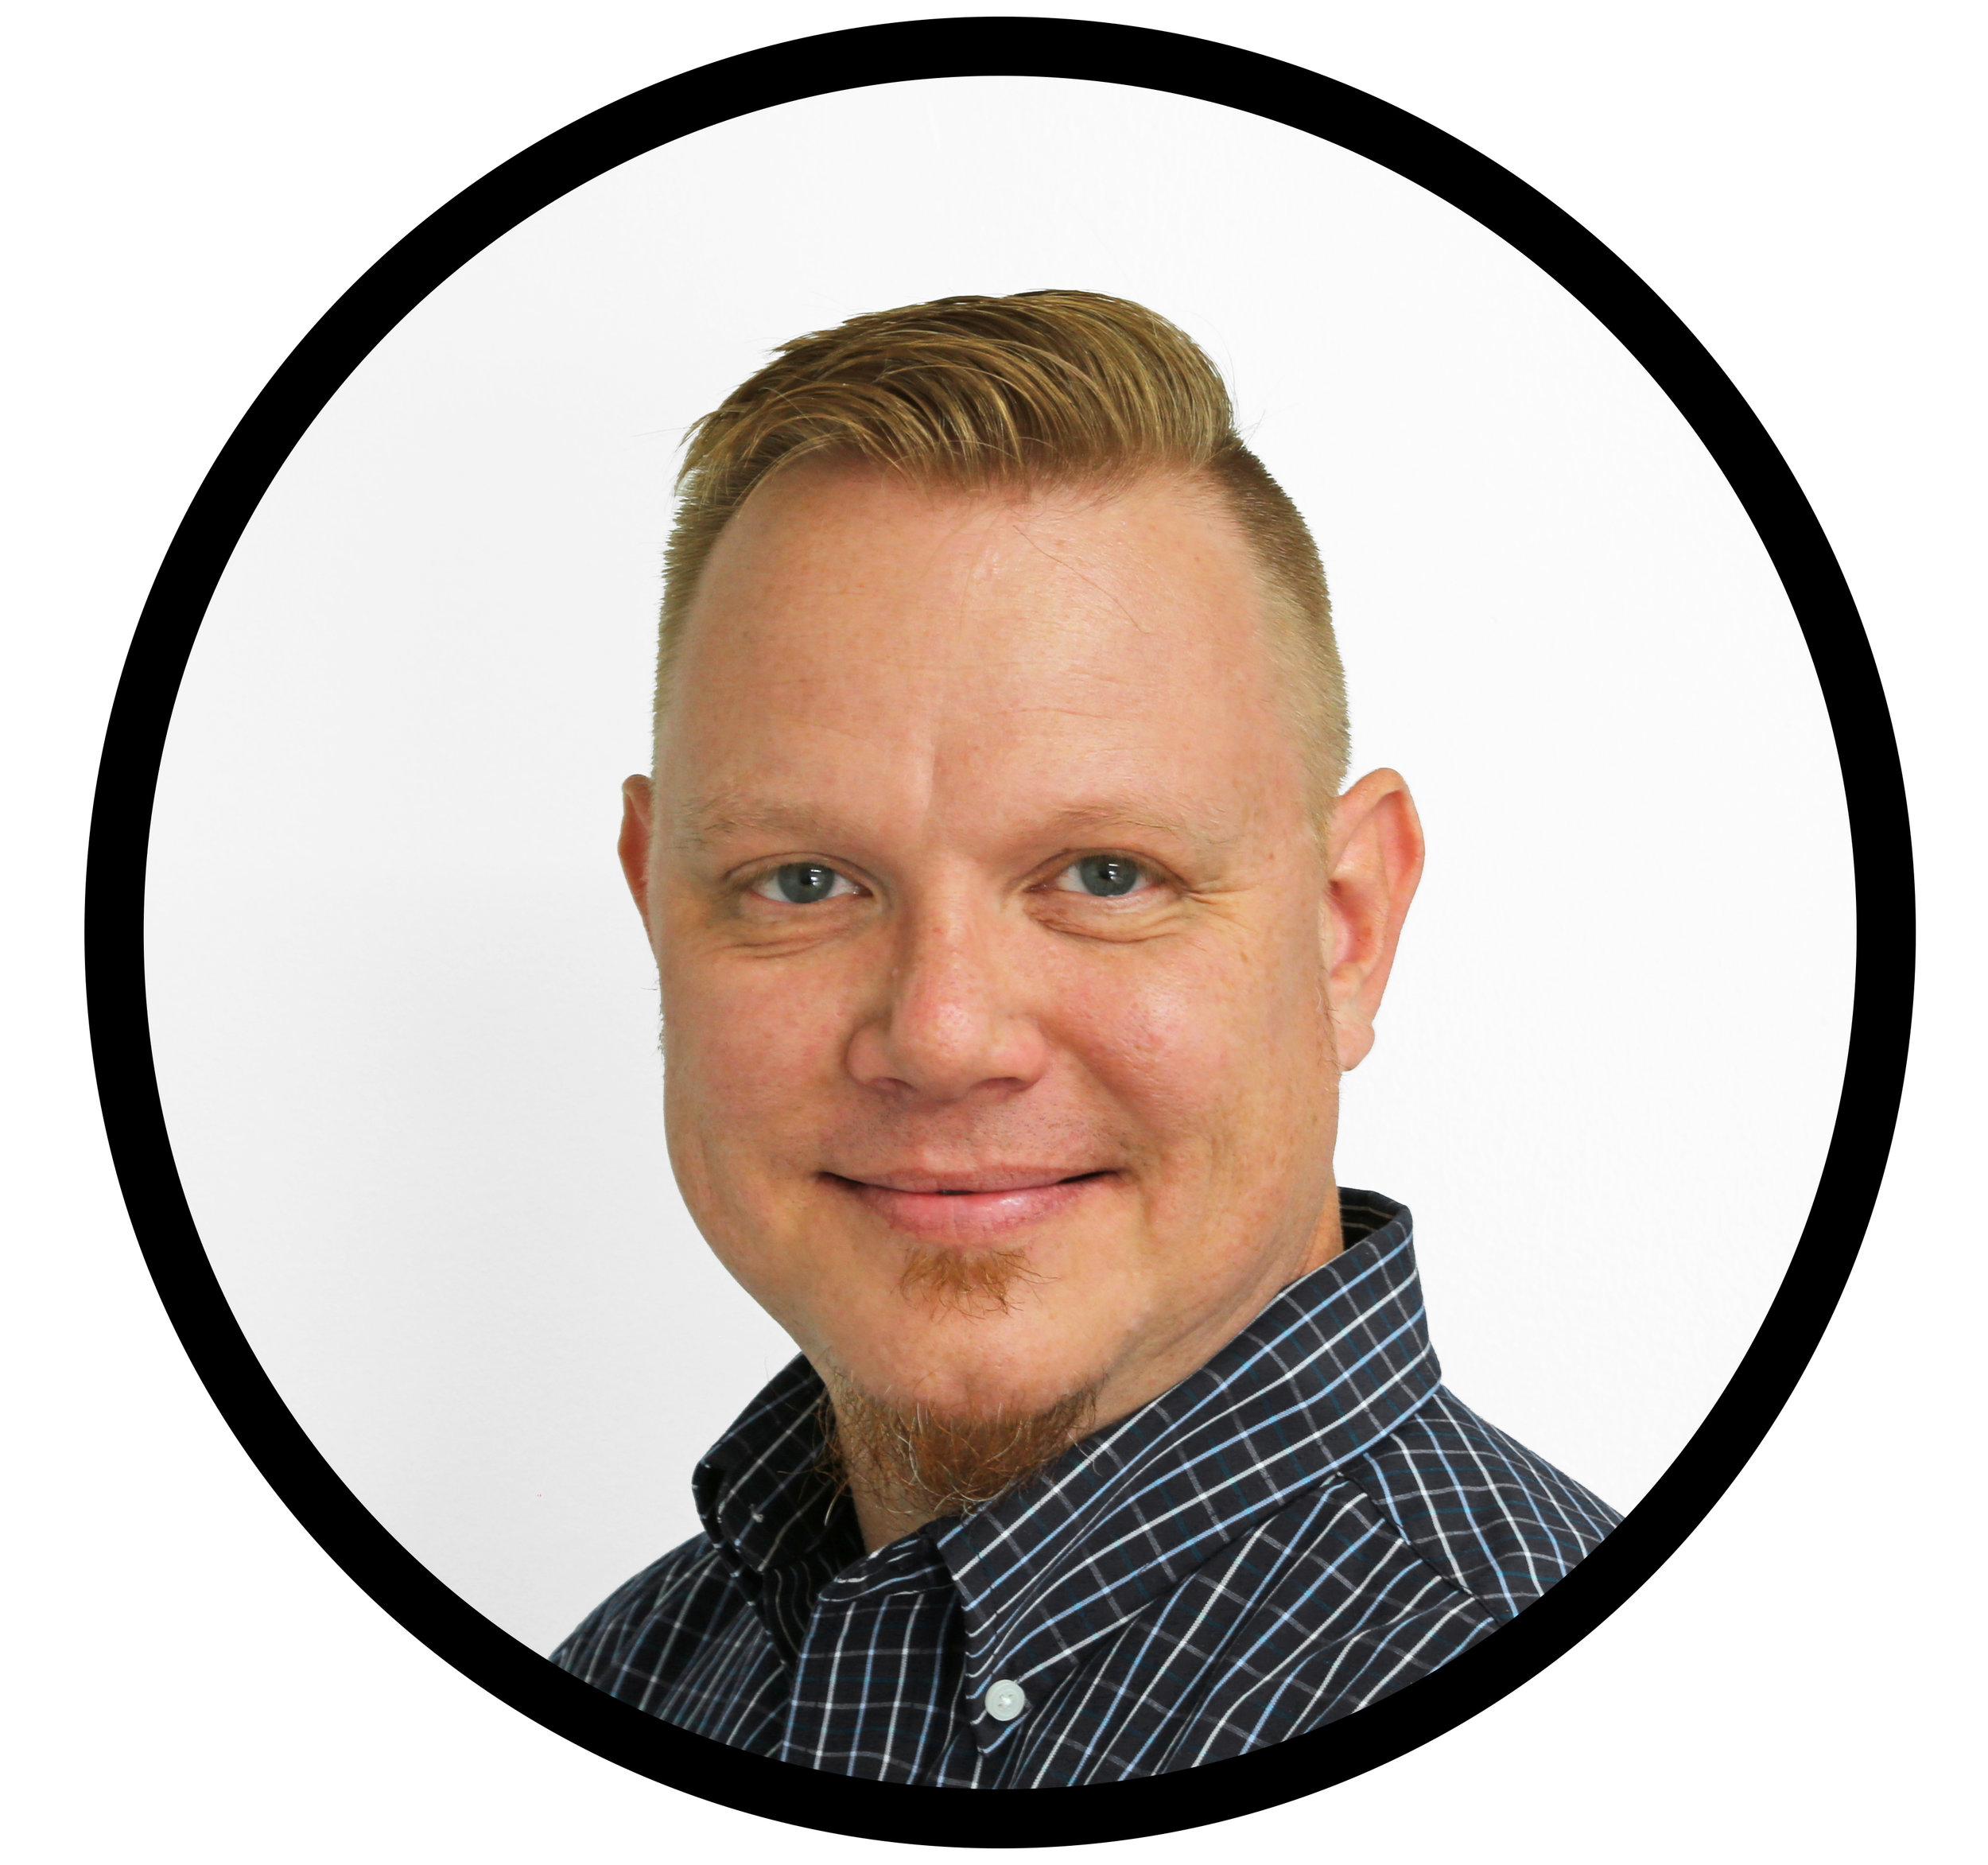 Head of Production Design - Adam Greenawalt